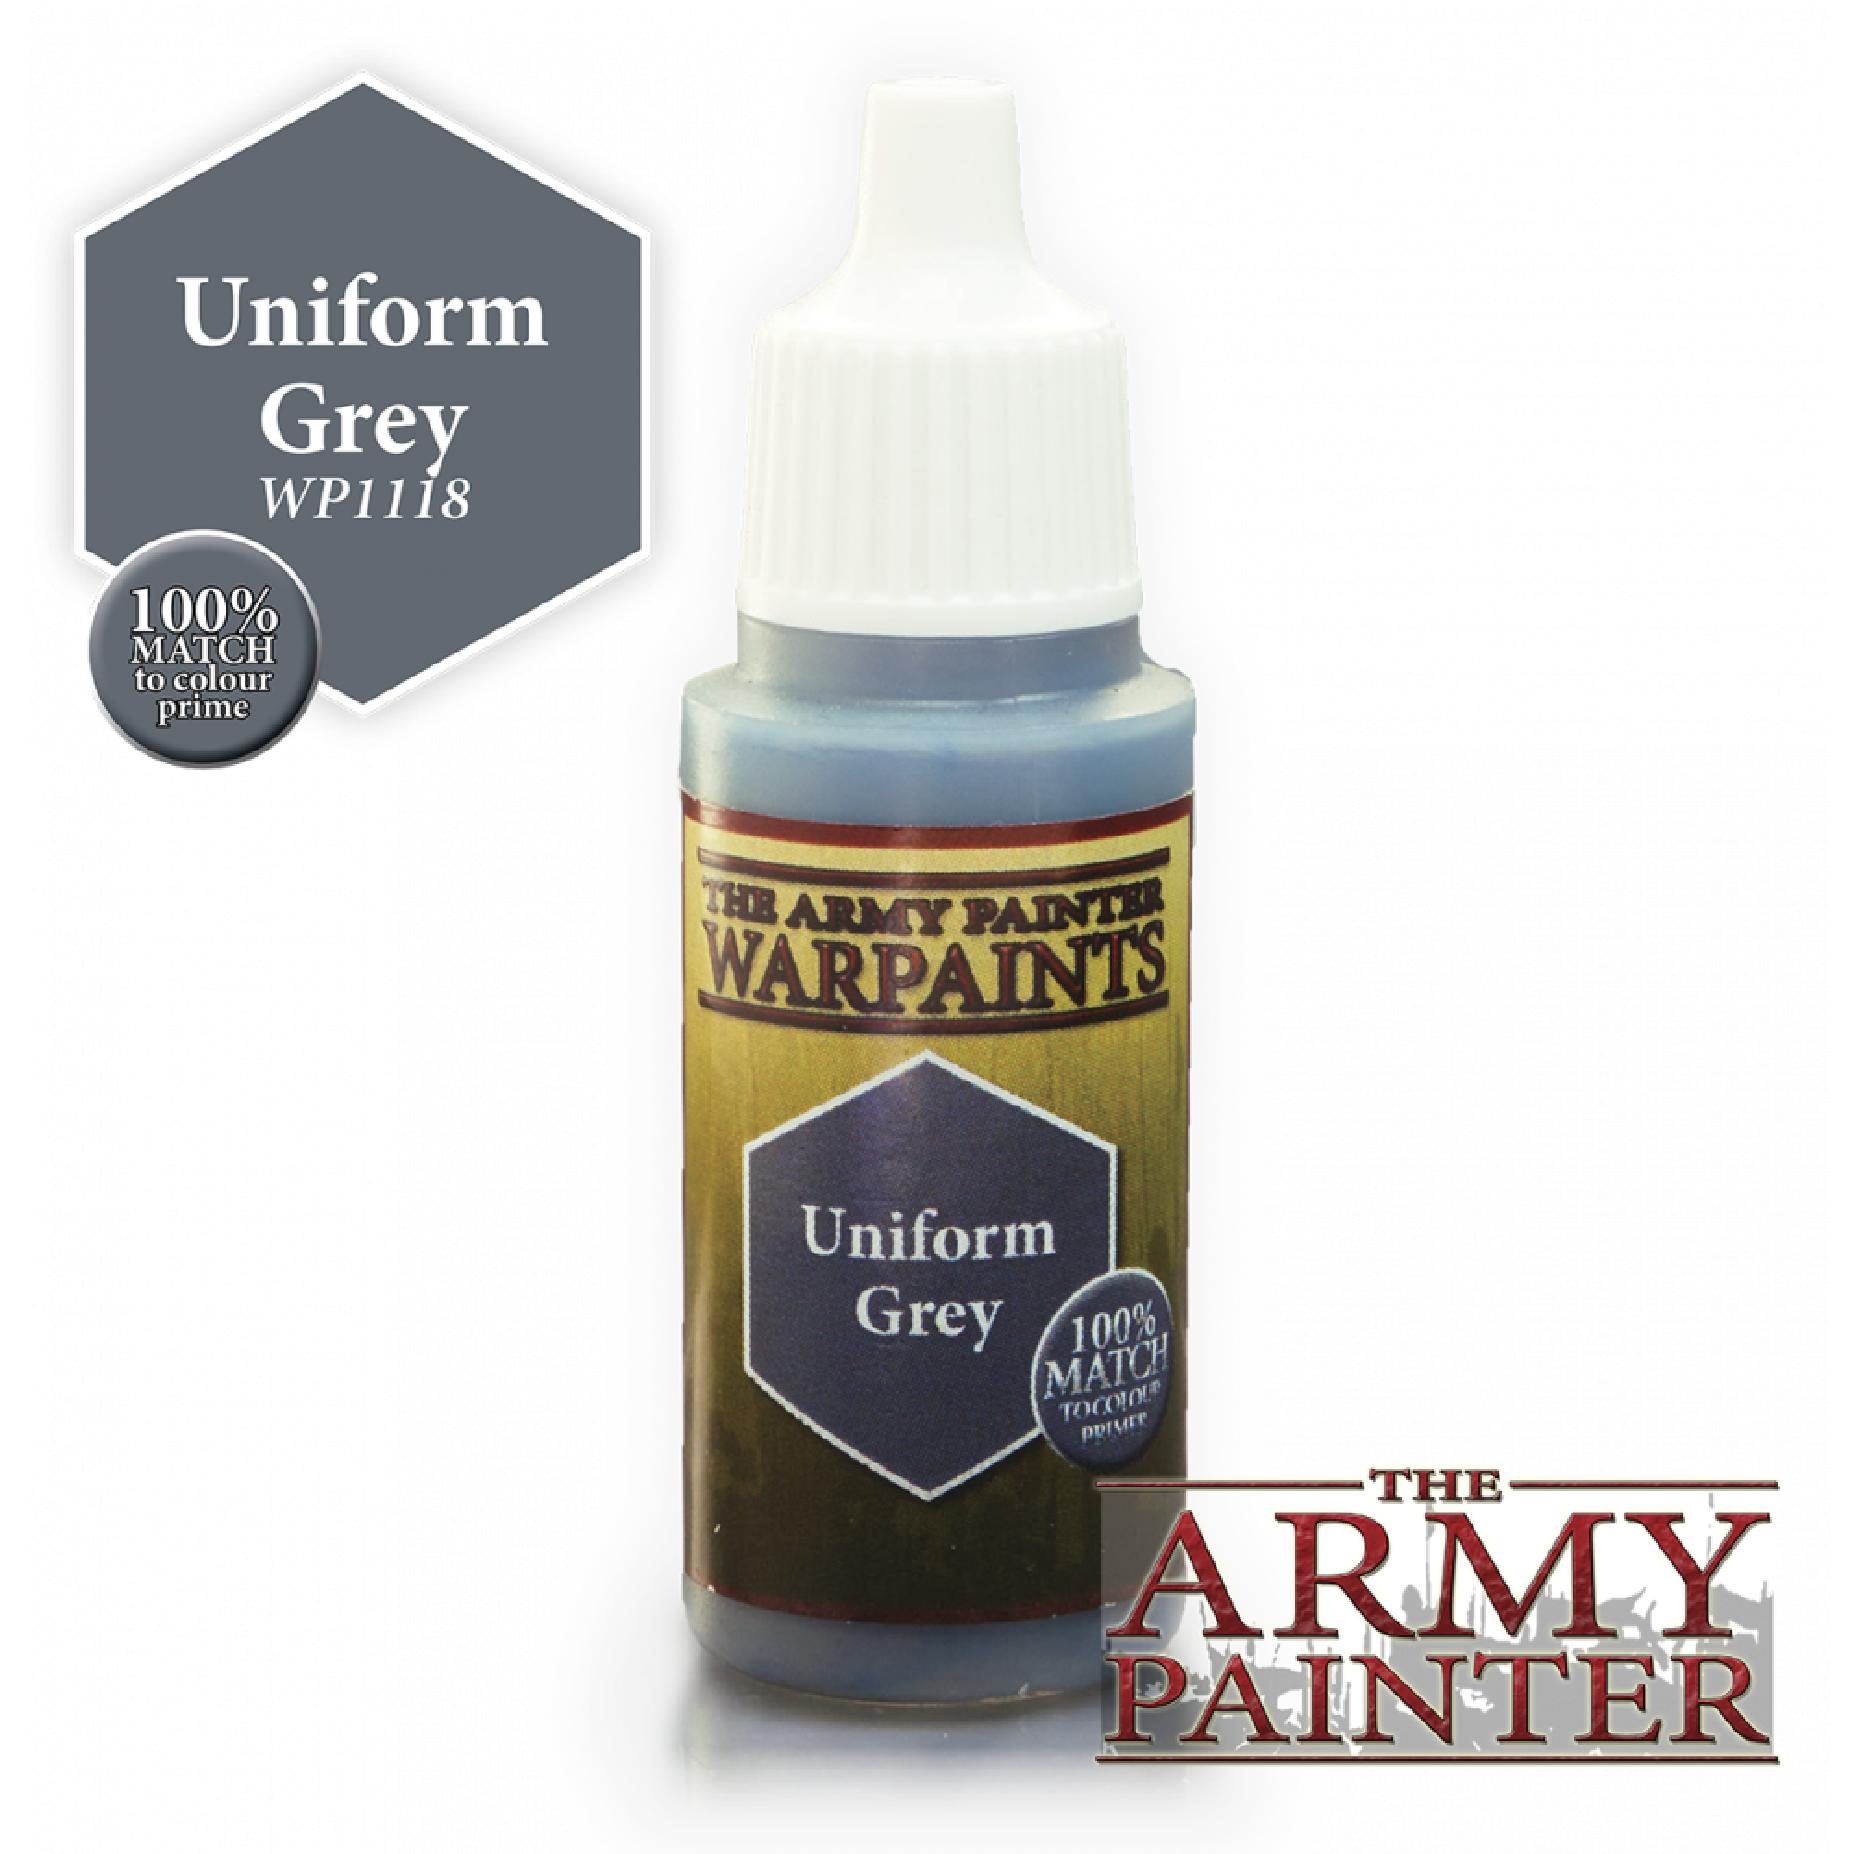 Army Painter Warpaint - Uniform Grey